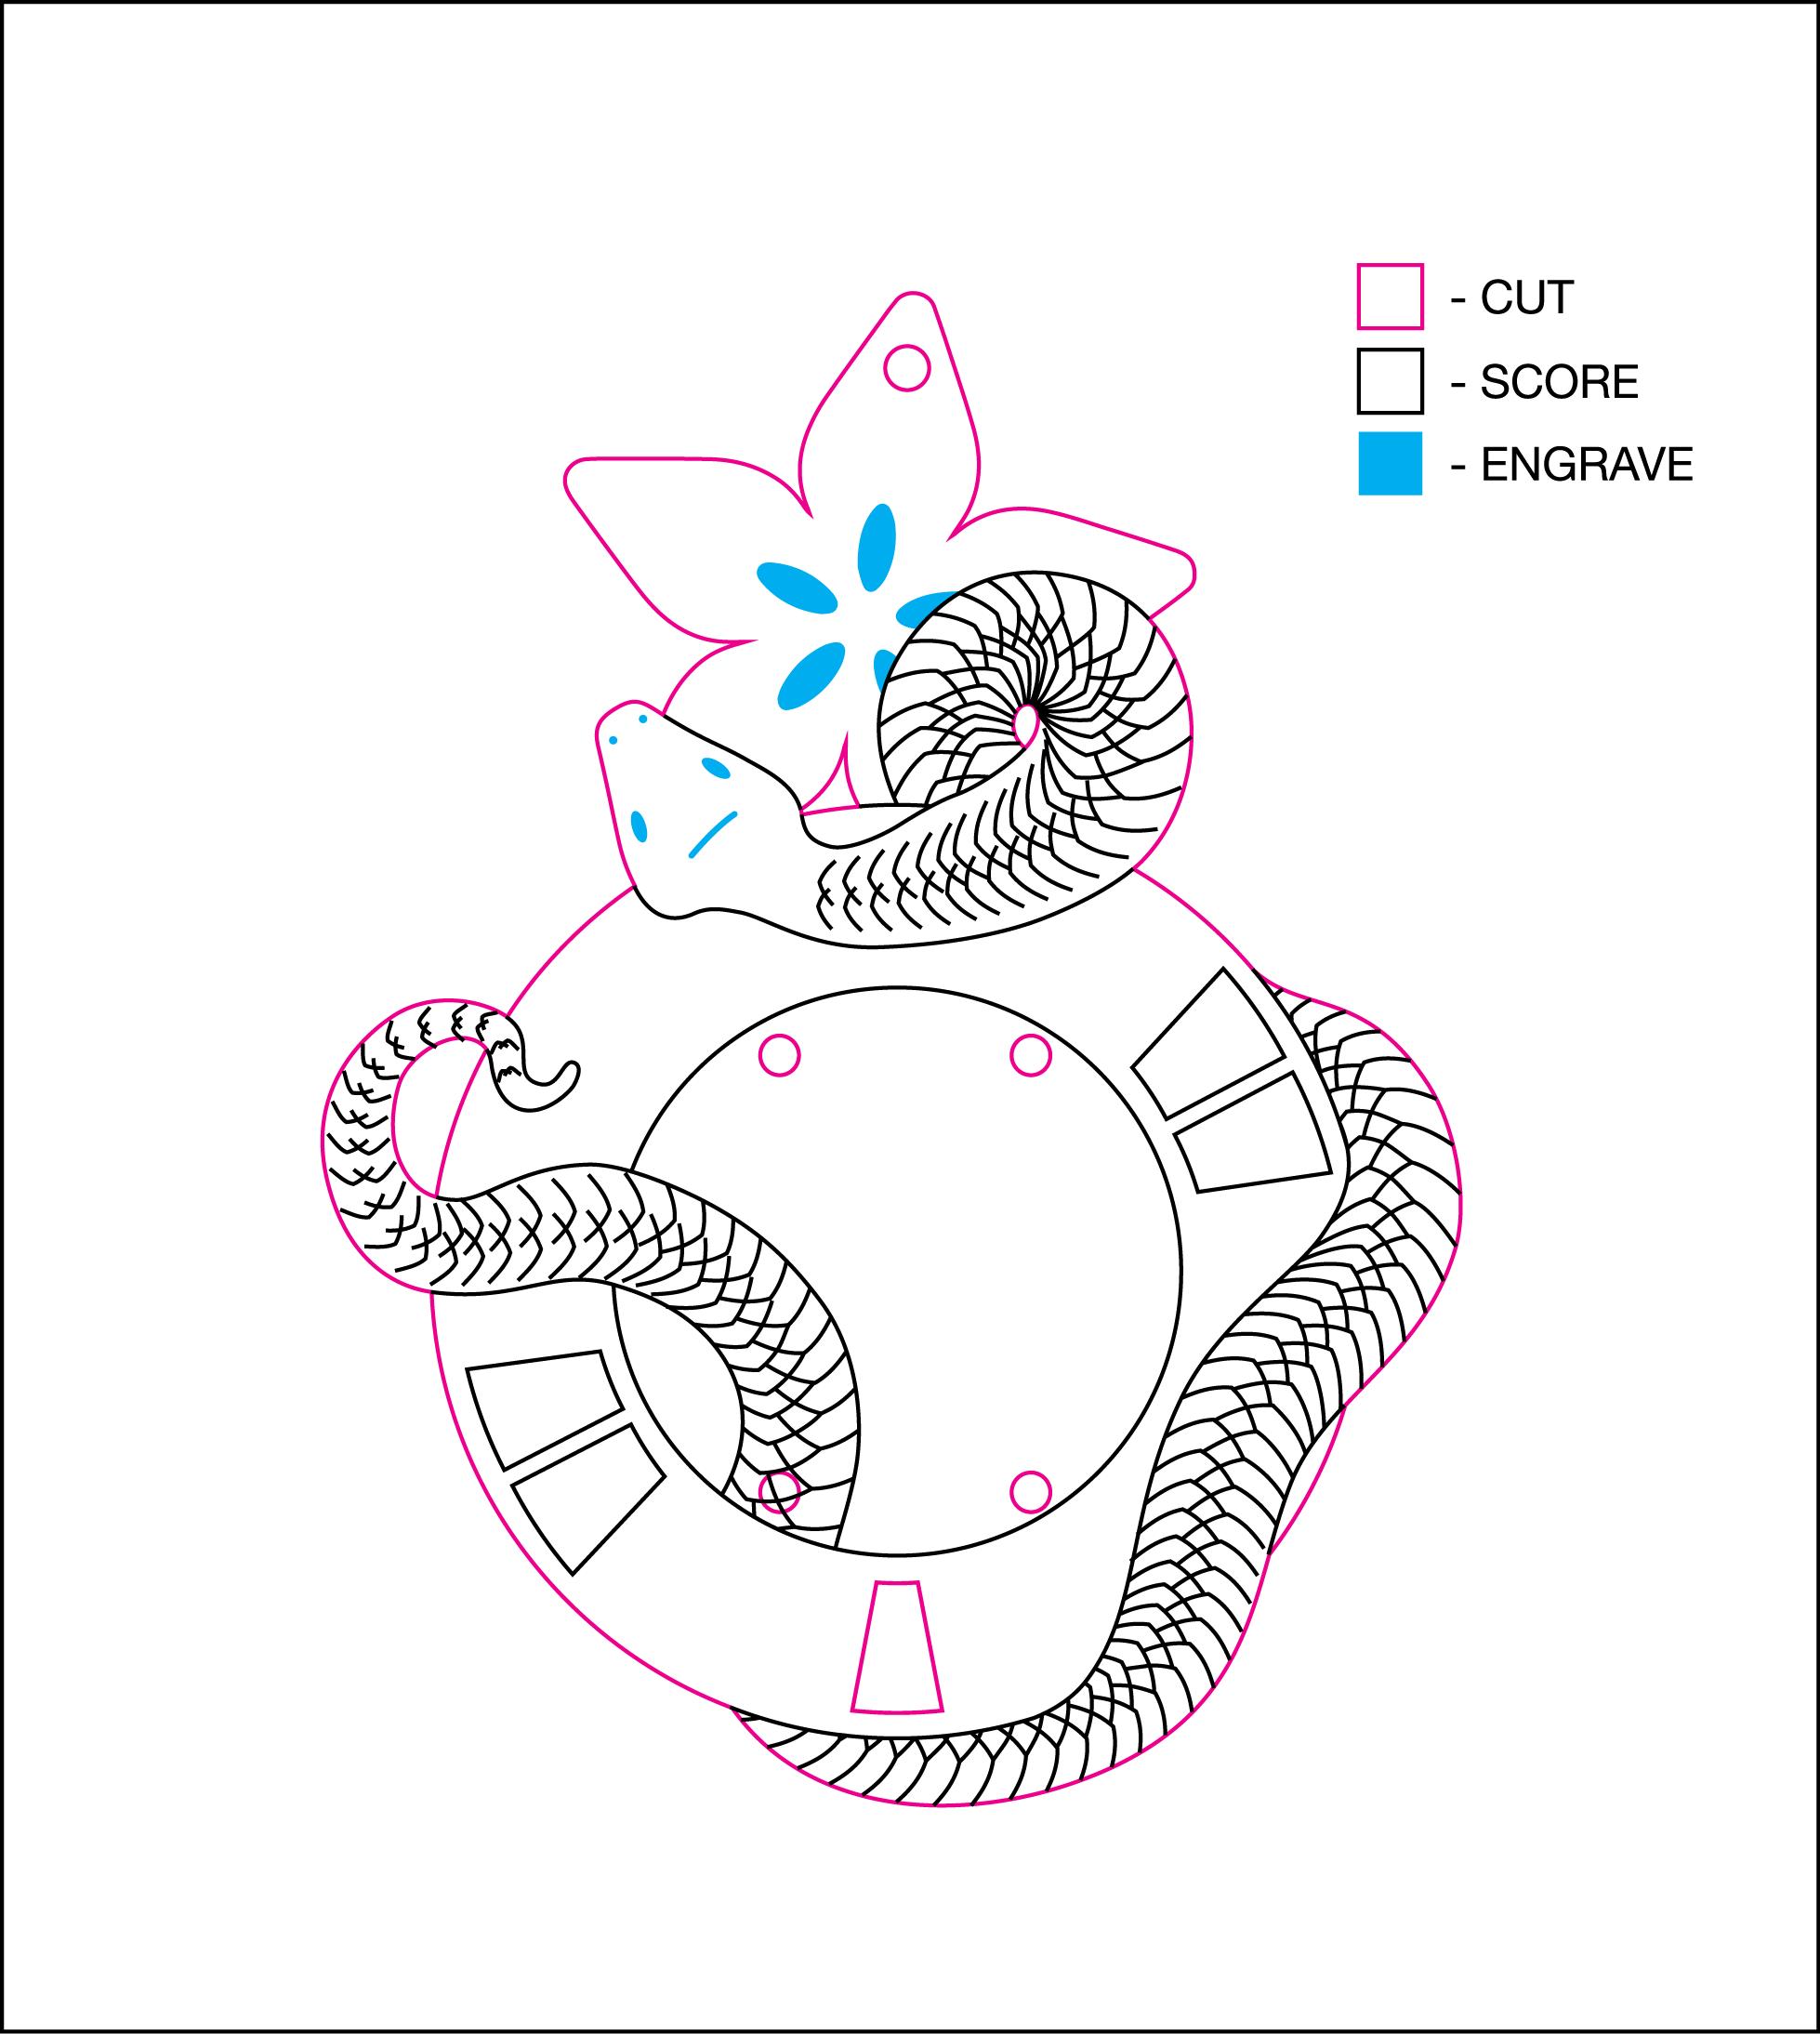 circuitpython_Badge_diagram.png